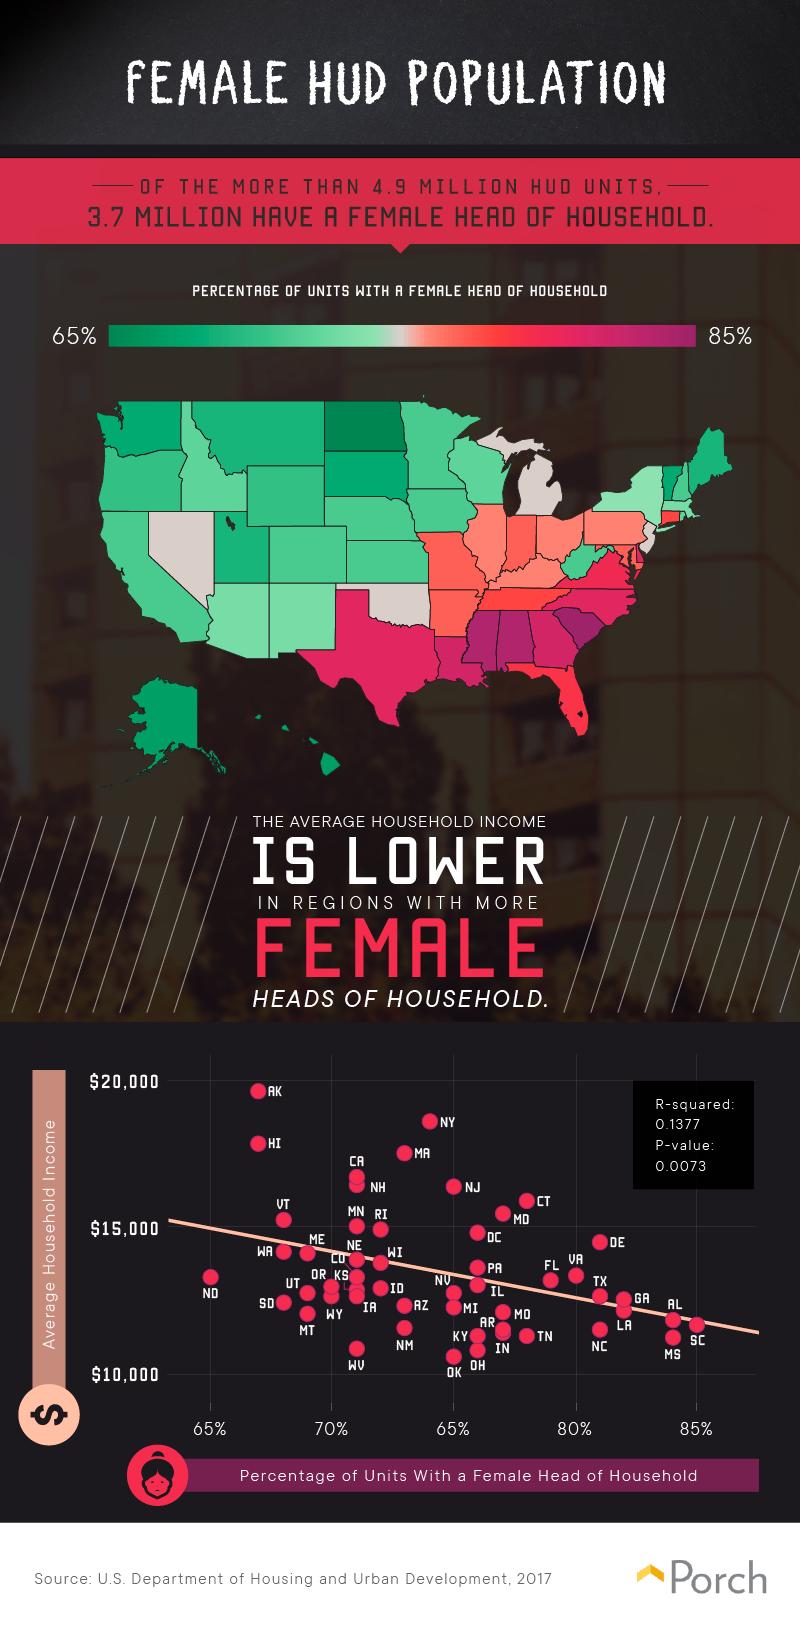 Female HUD population